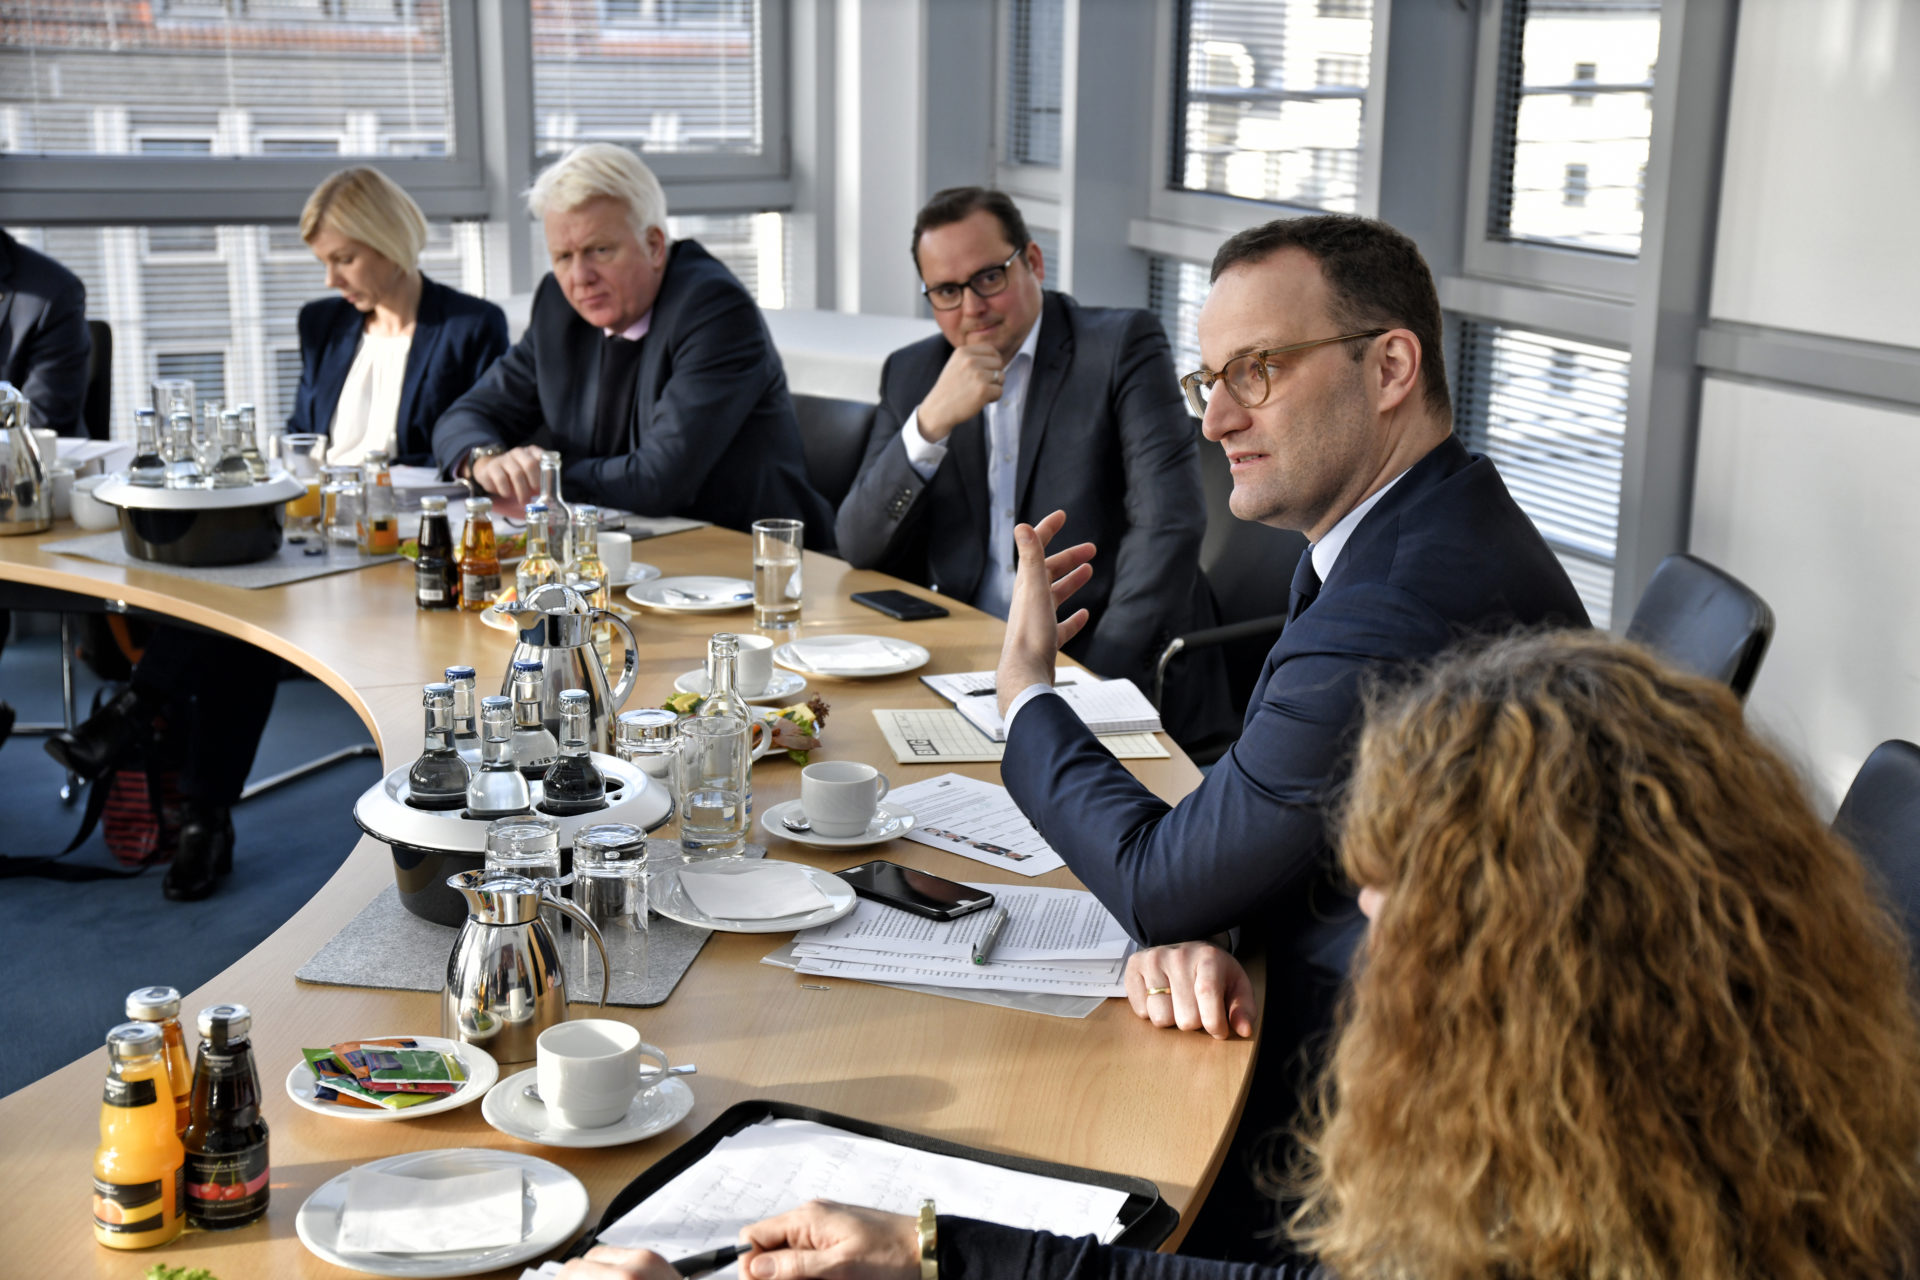 Jens Spahn, Bundesgesundheitsminister